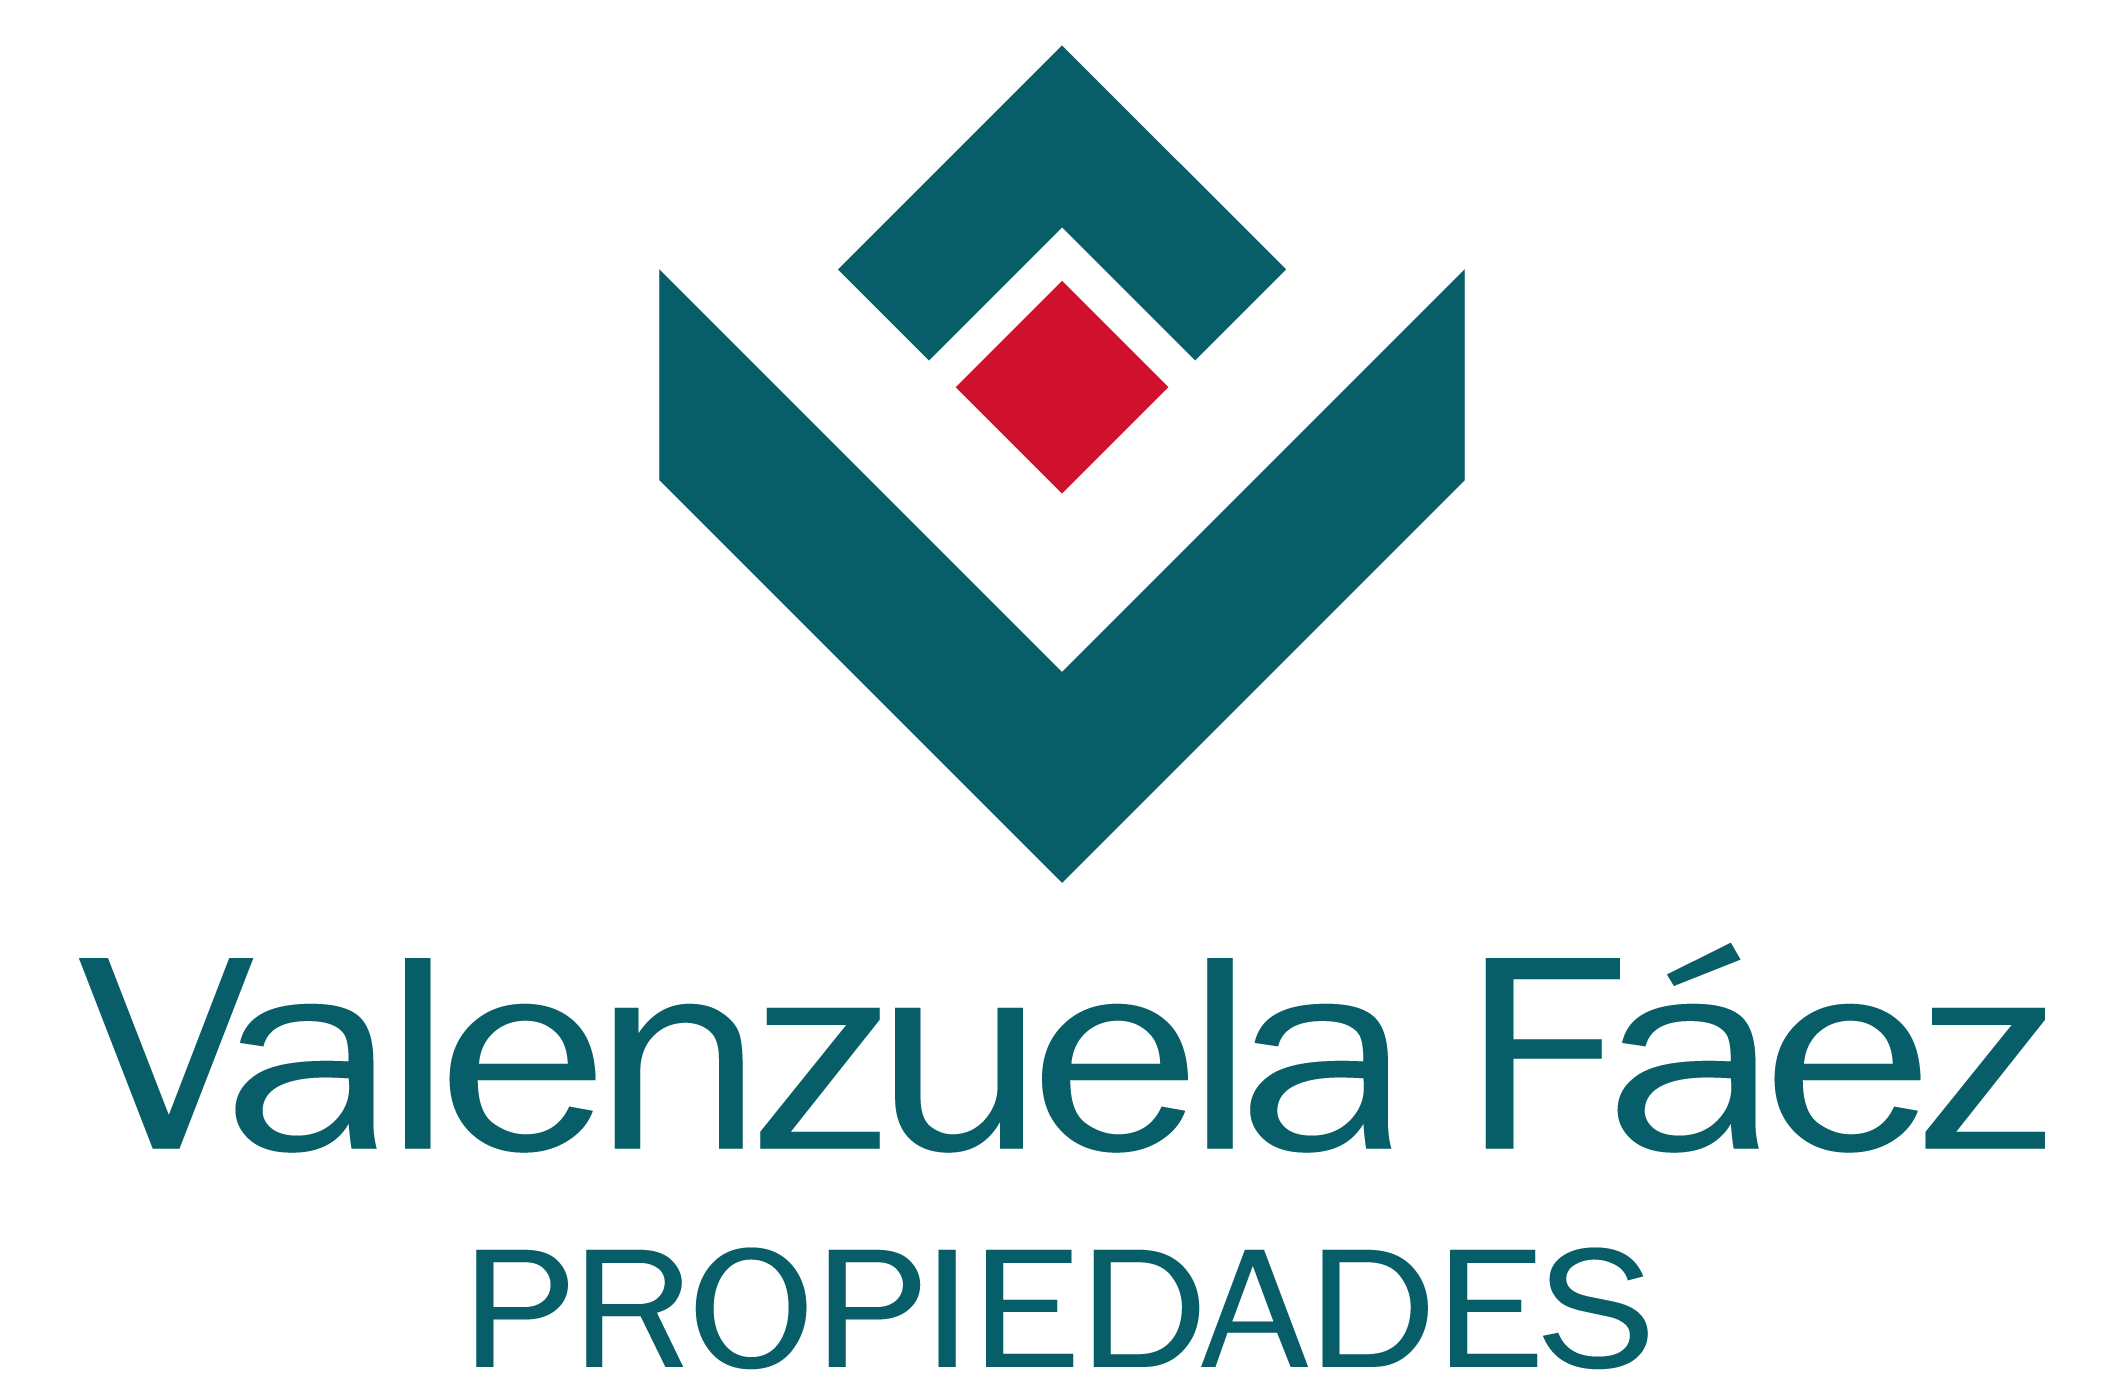 Valenzuela Fáez – Propiedades